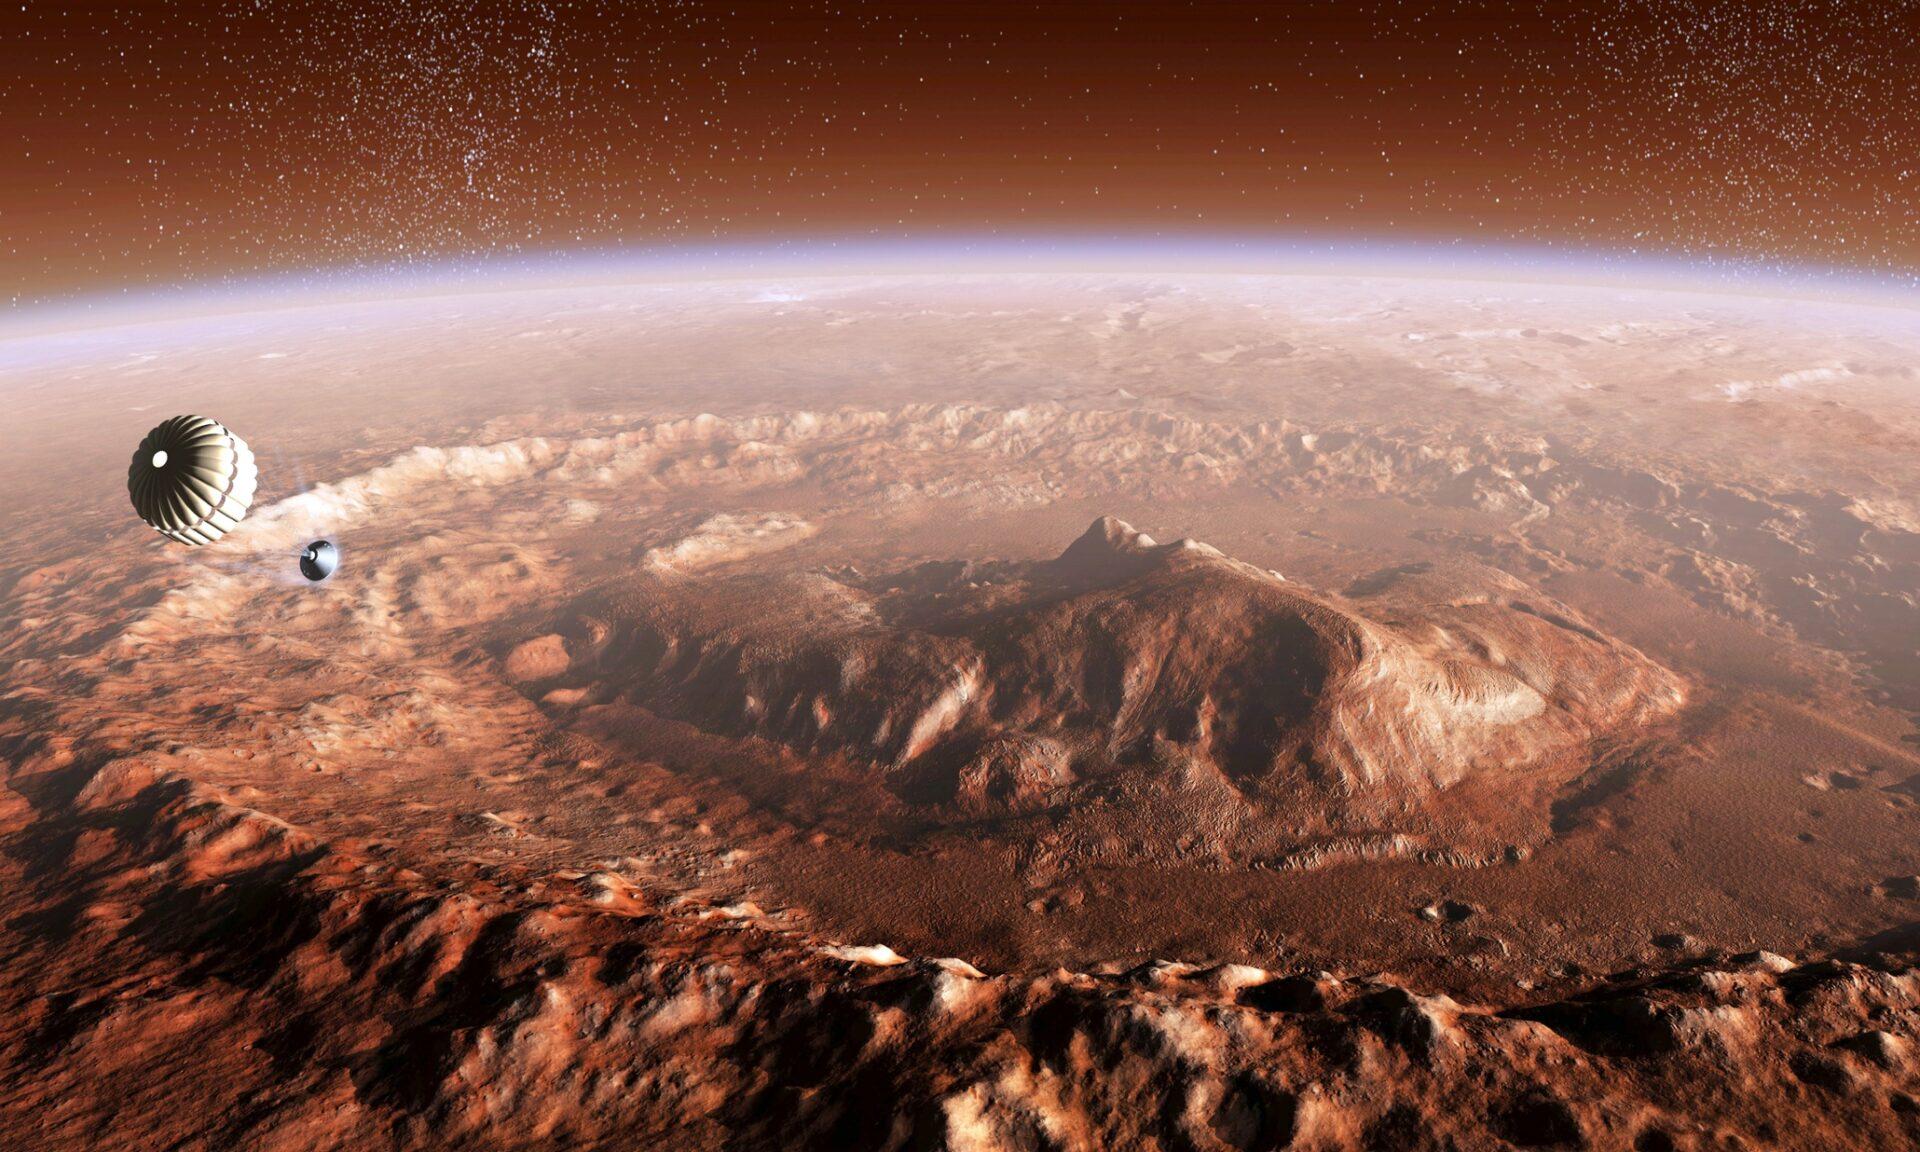 CBM8M4 Curiosity rover descending into Gale Crate on Mars.Stocktrek Images, Inc. / Alamy